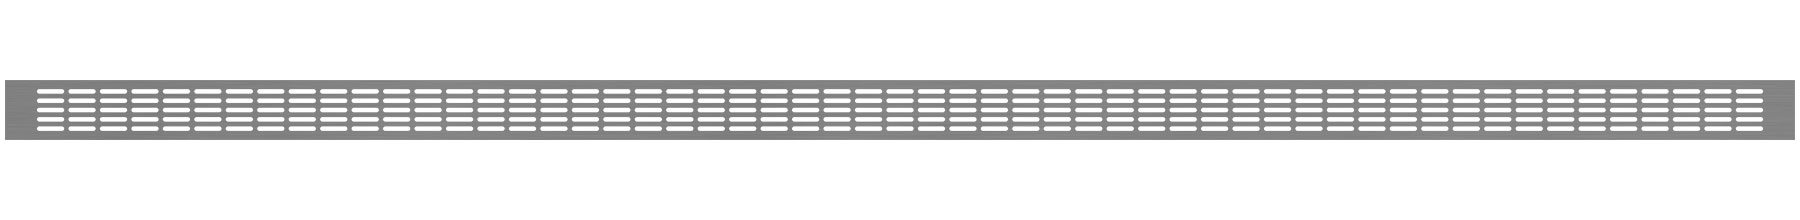 VRS-008 - Ventilaciona rešetka 66×1980 mm